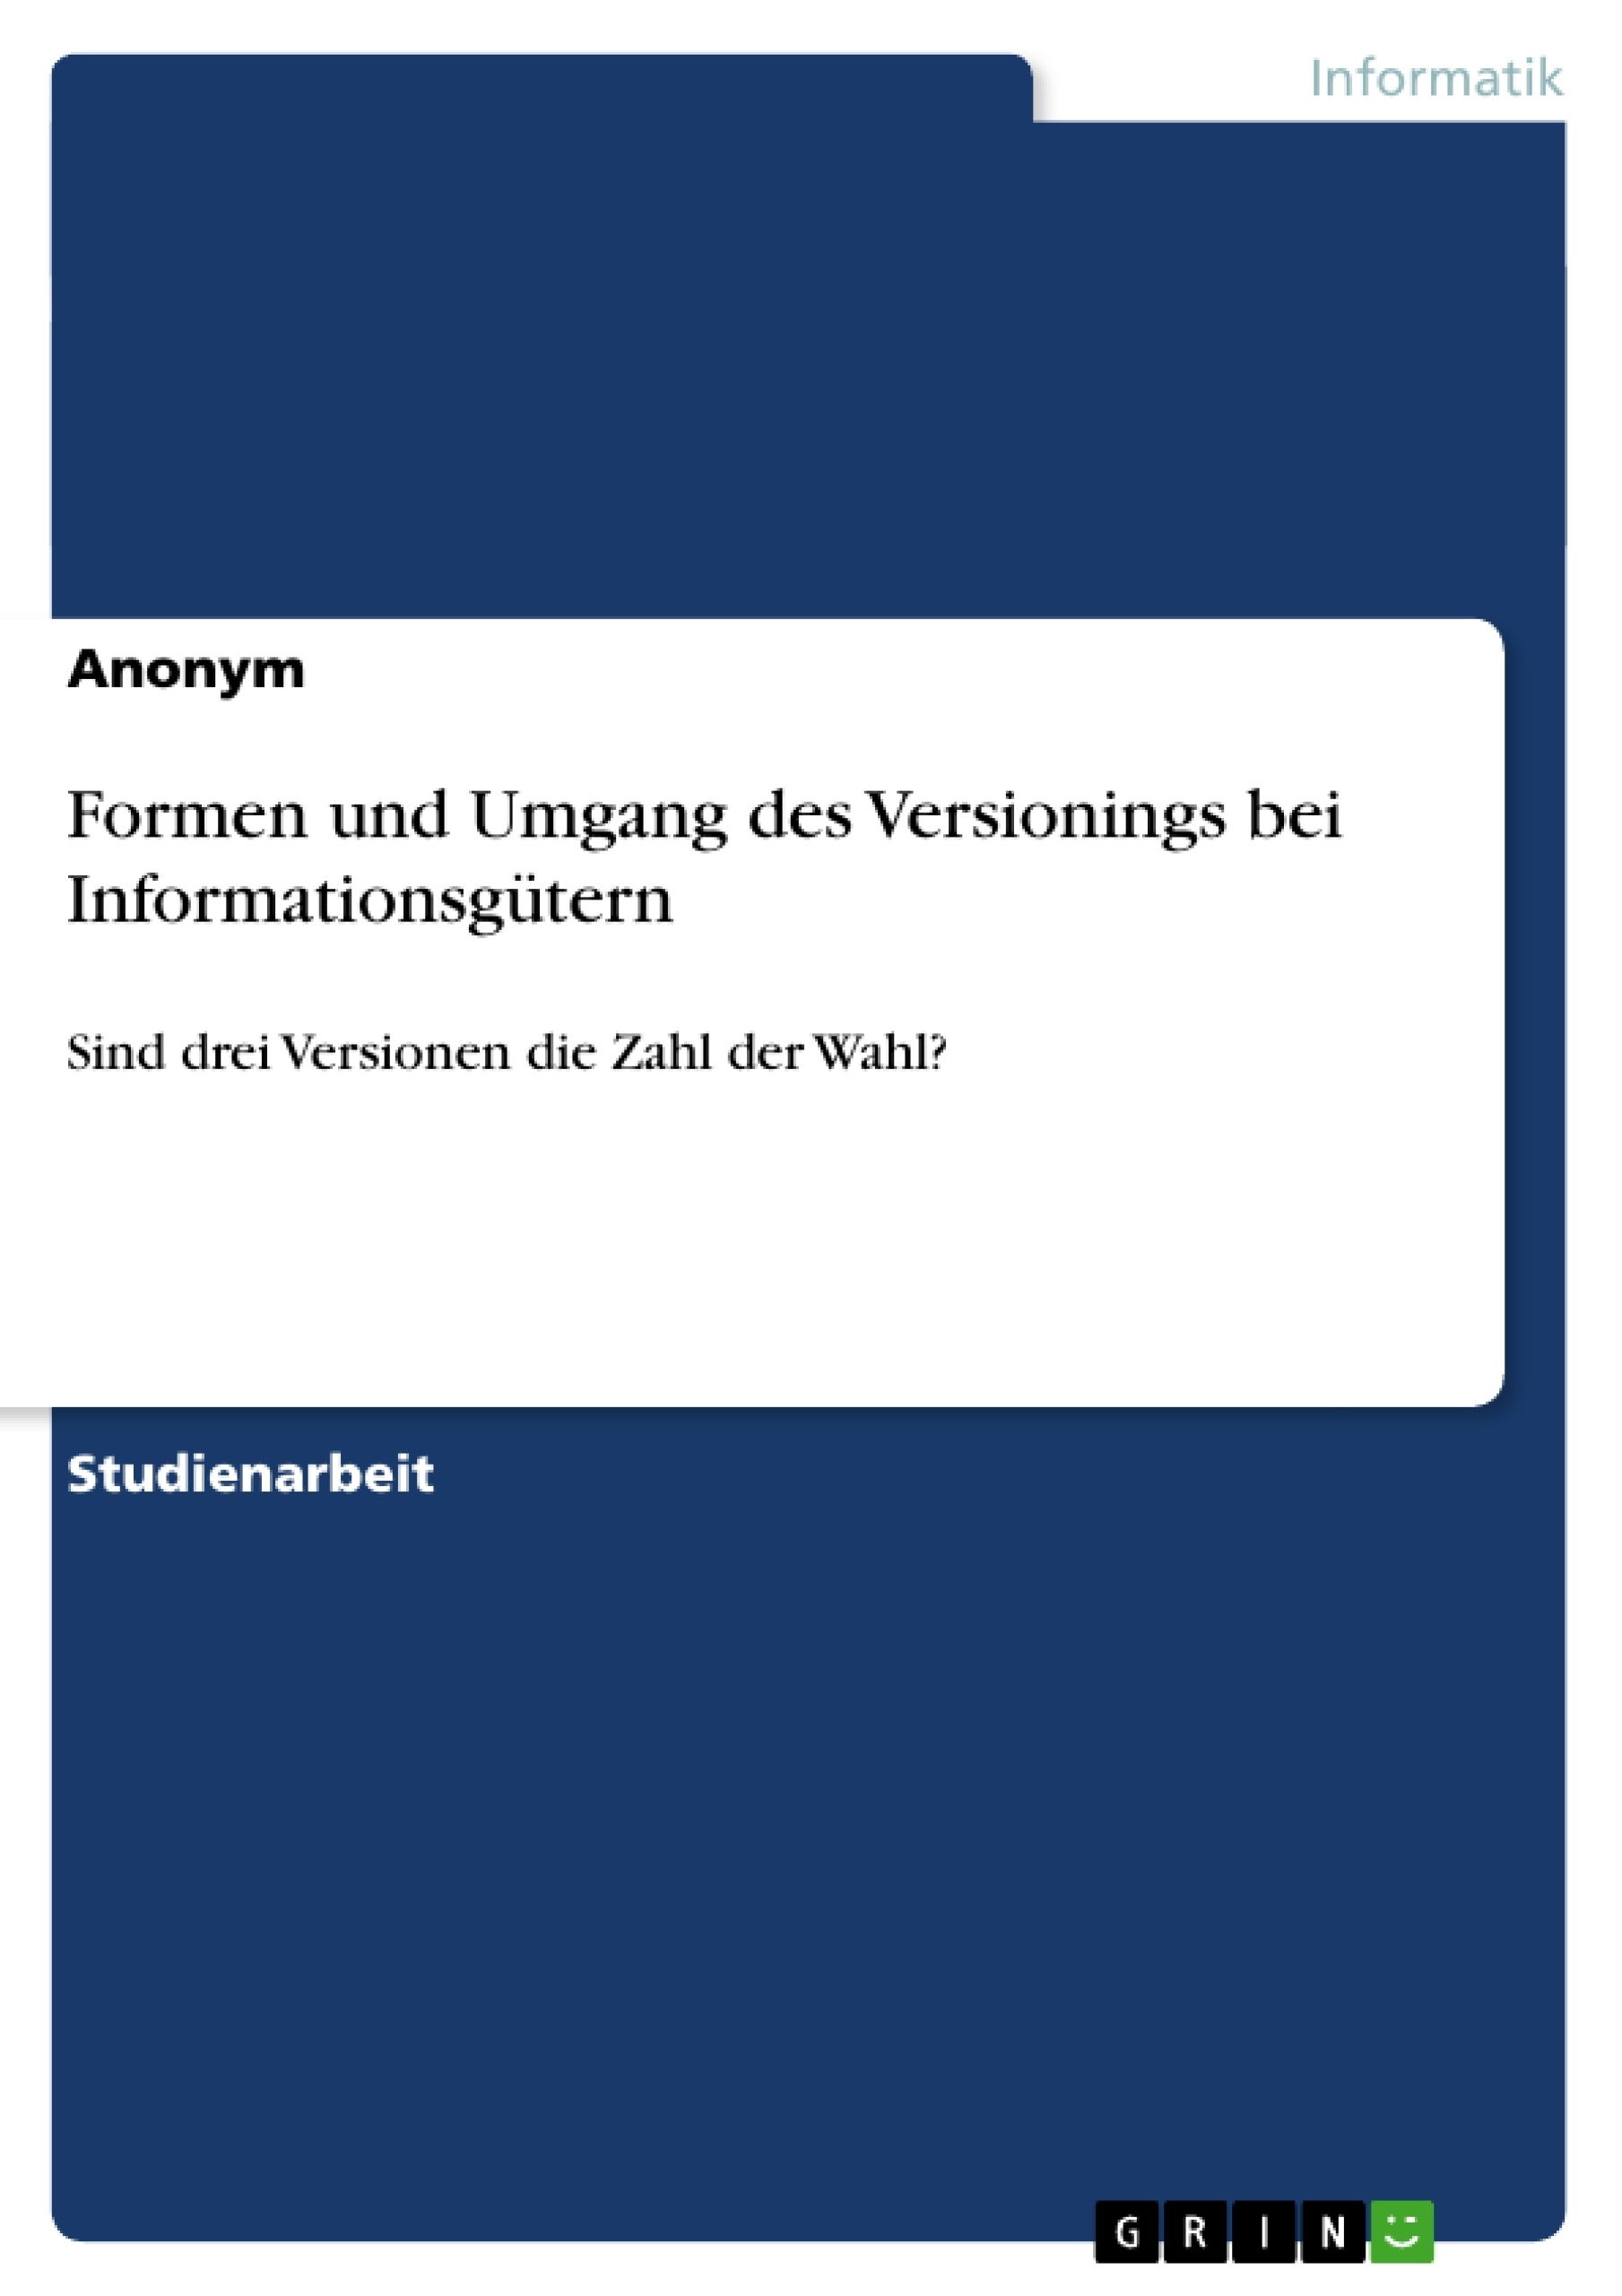 Titel: Formen und Umgang des Versionings bei Informationsgütern